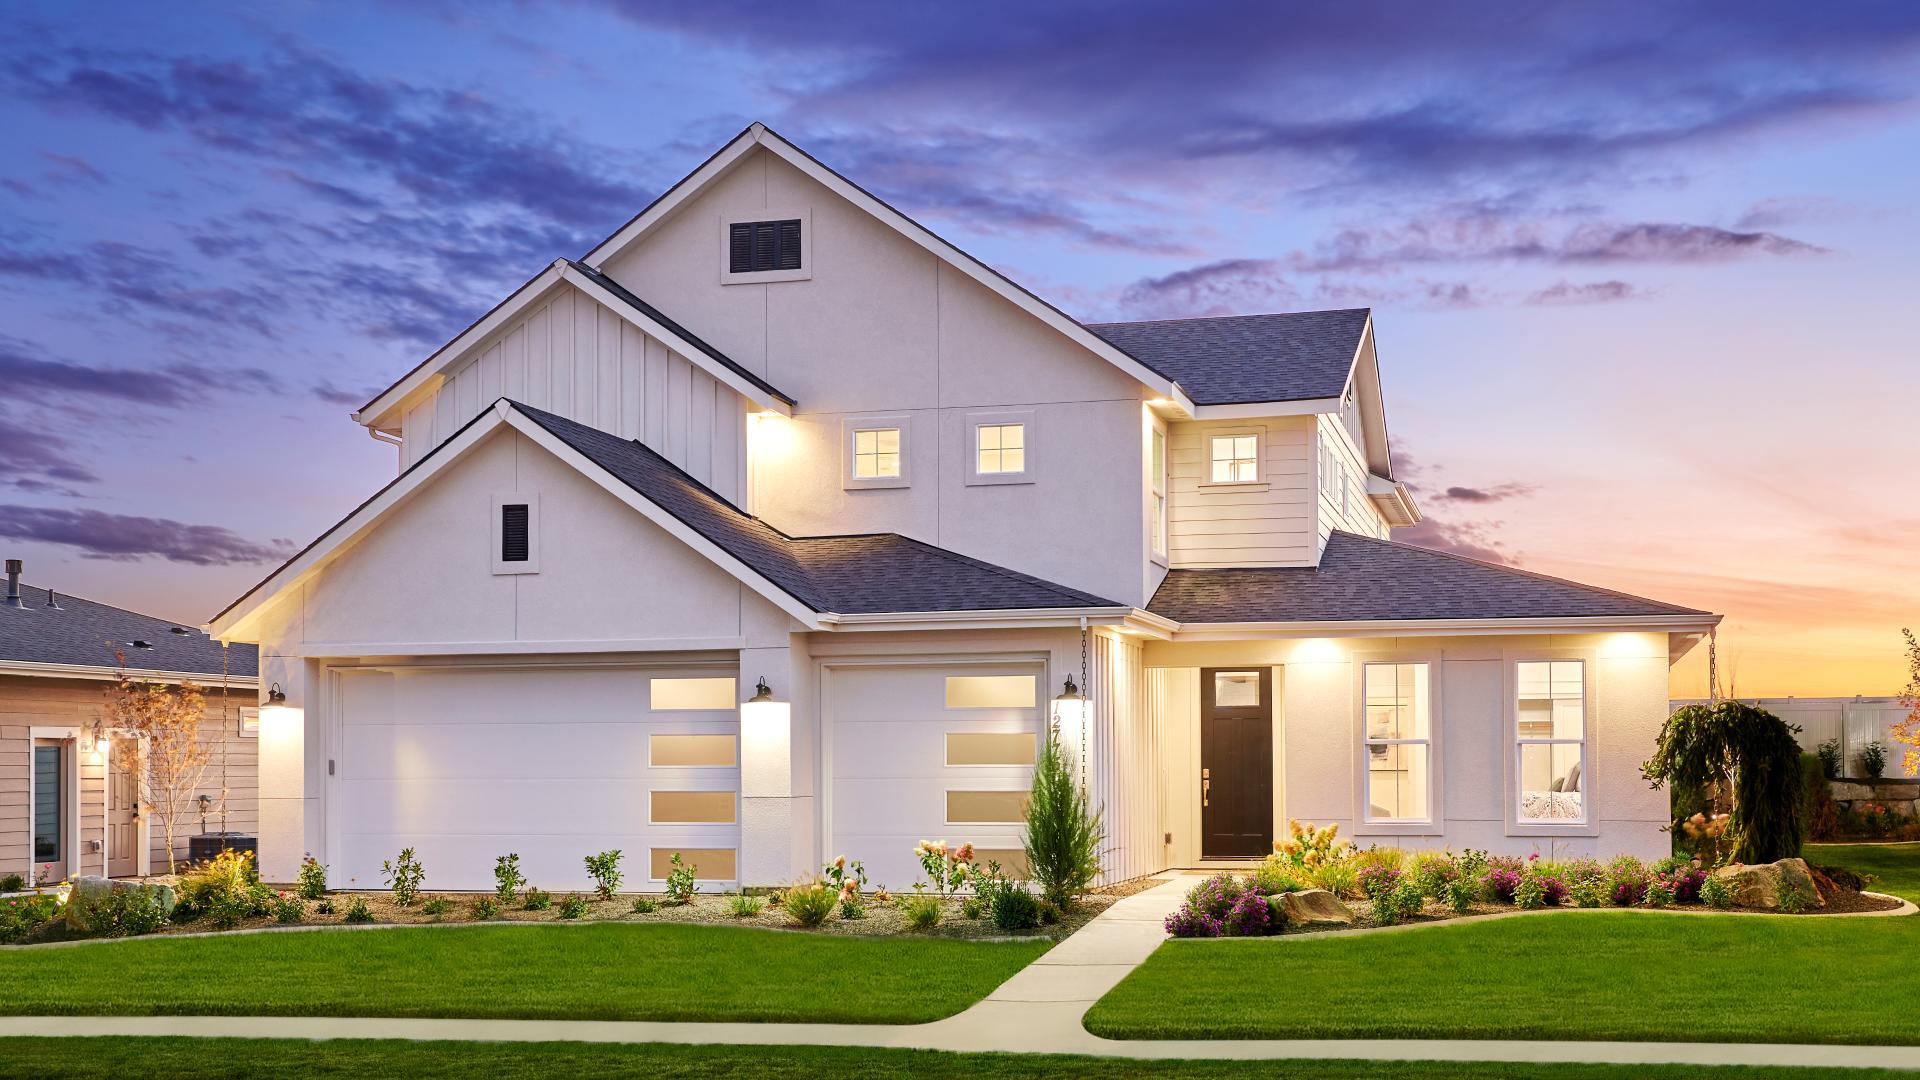 New modern exterior designs